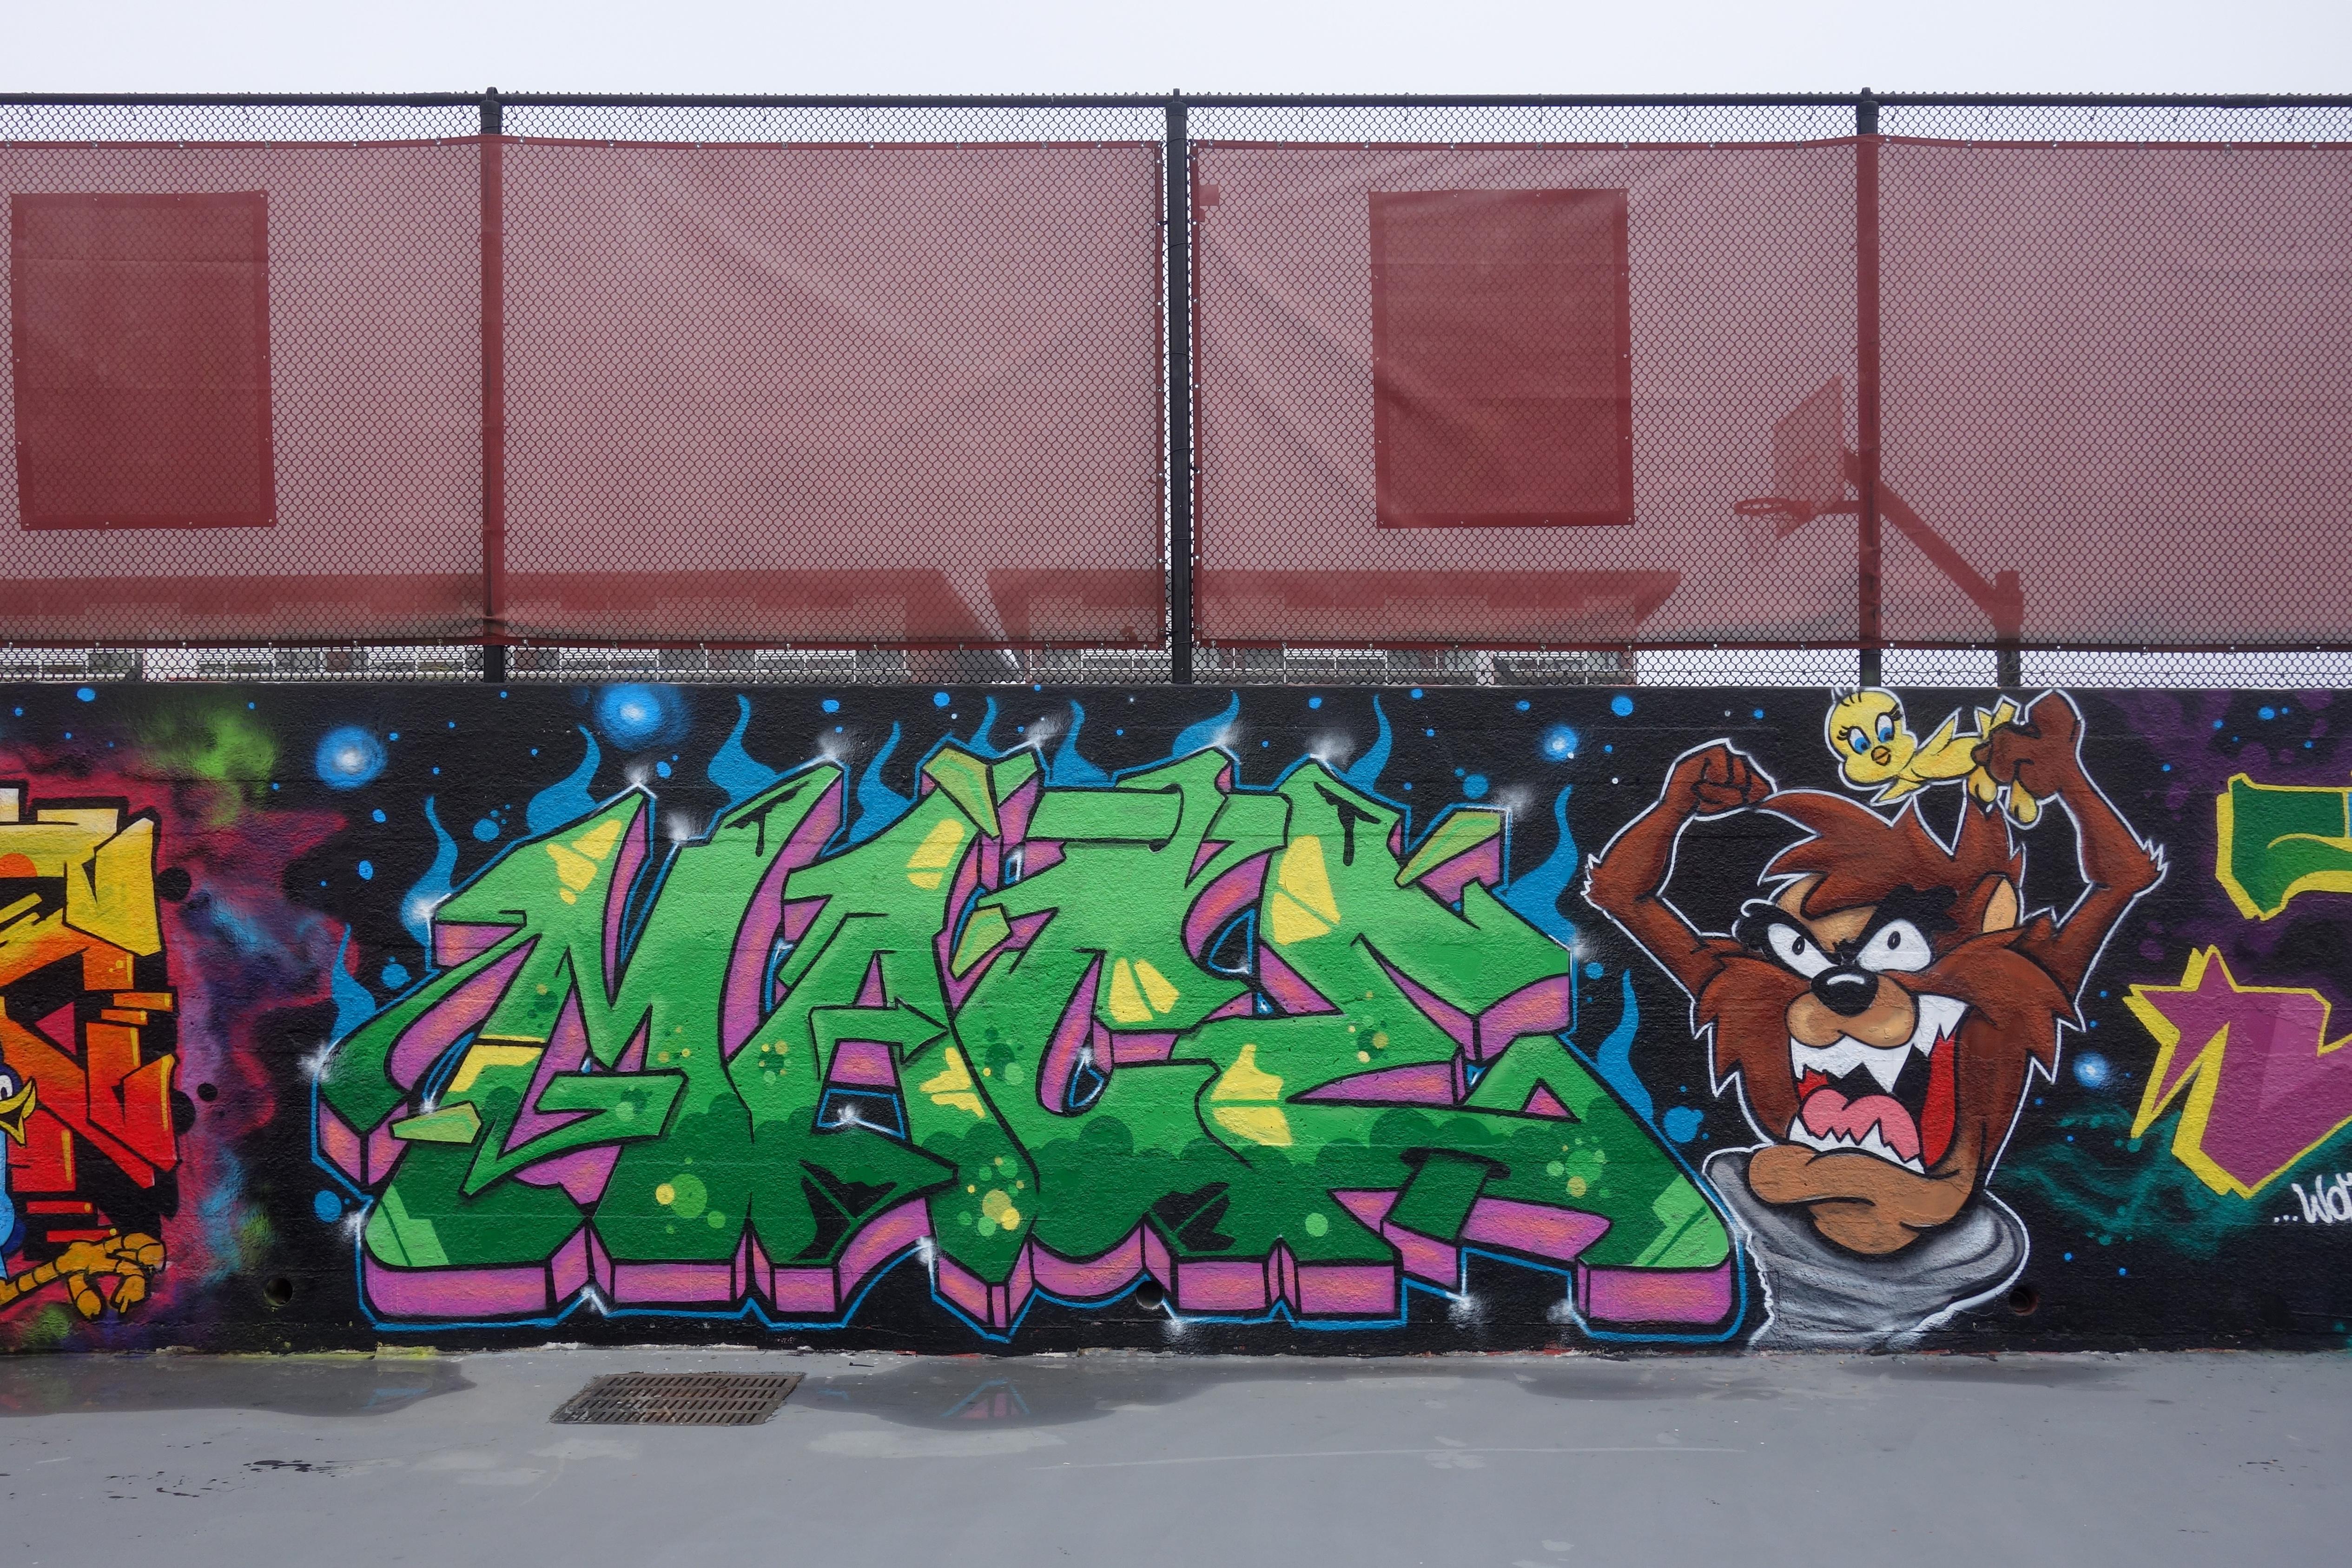 Mace WOD graffiti crew